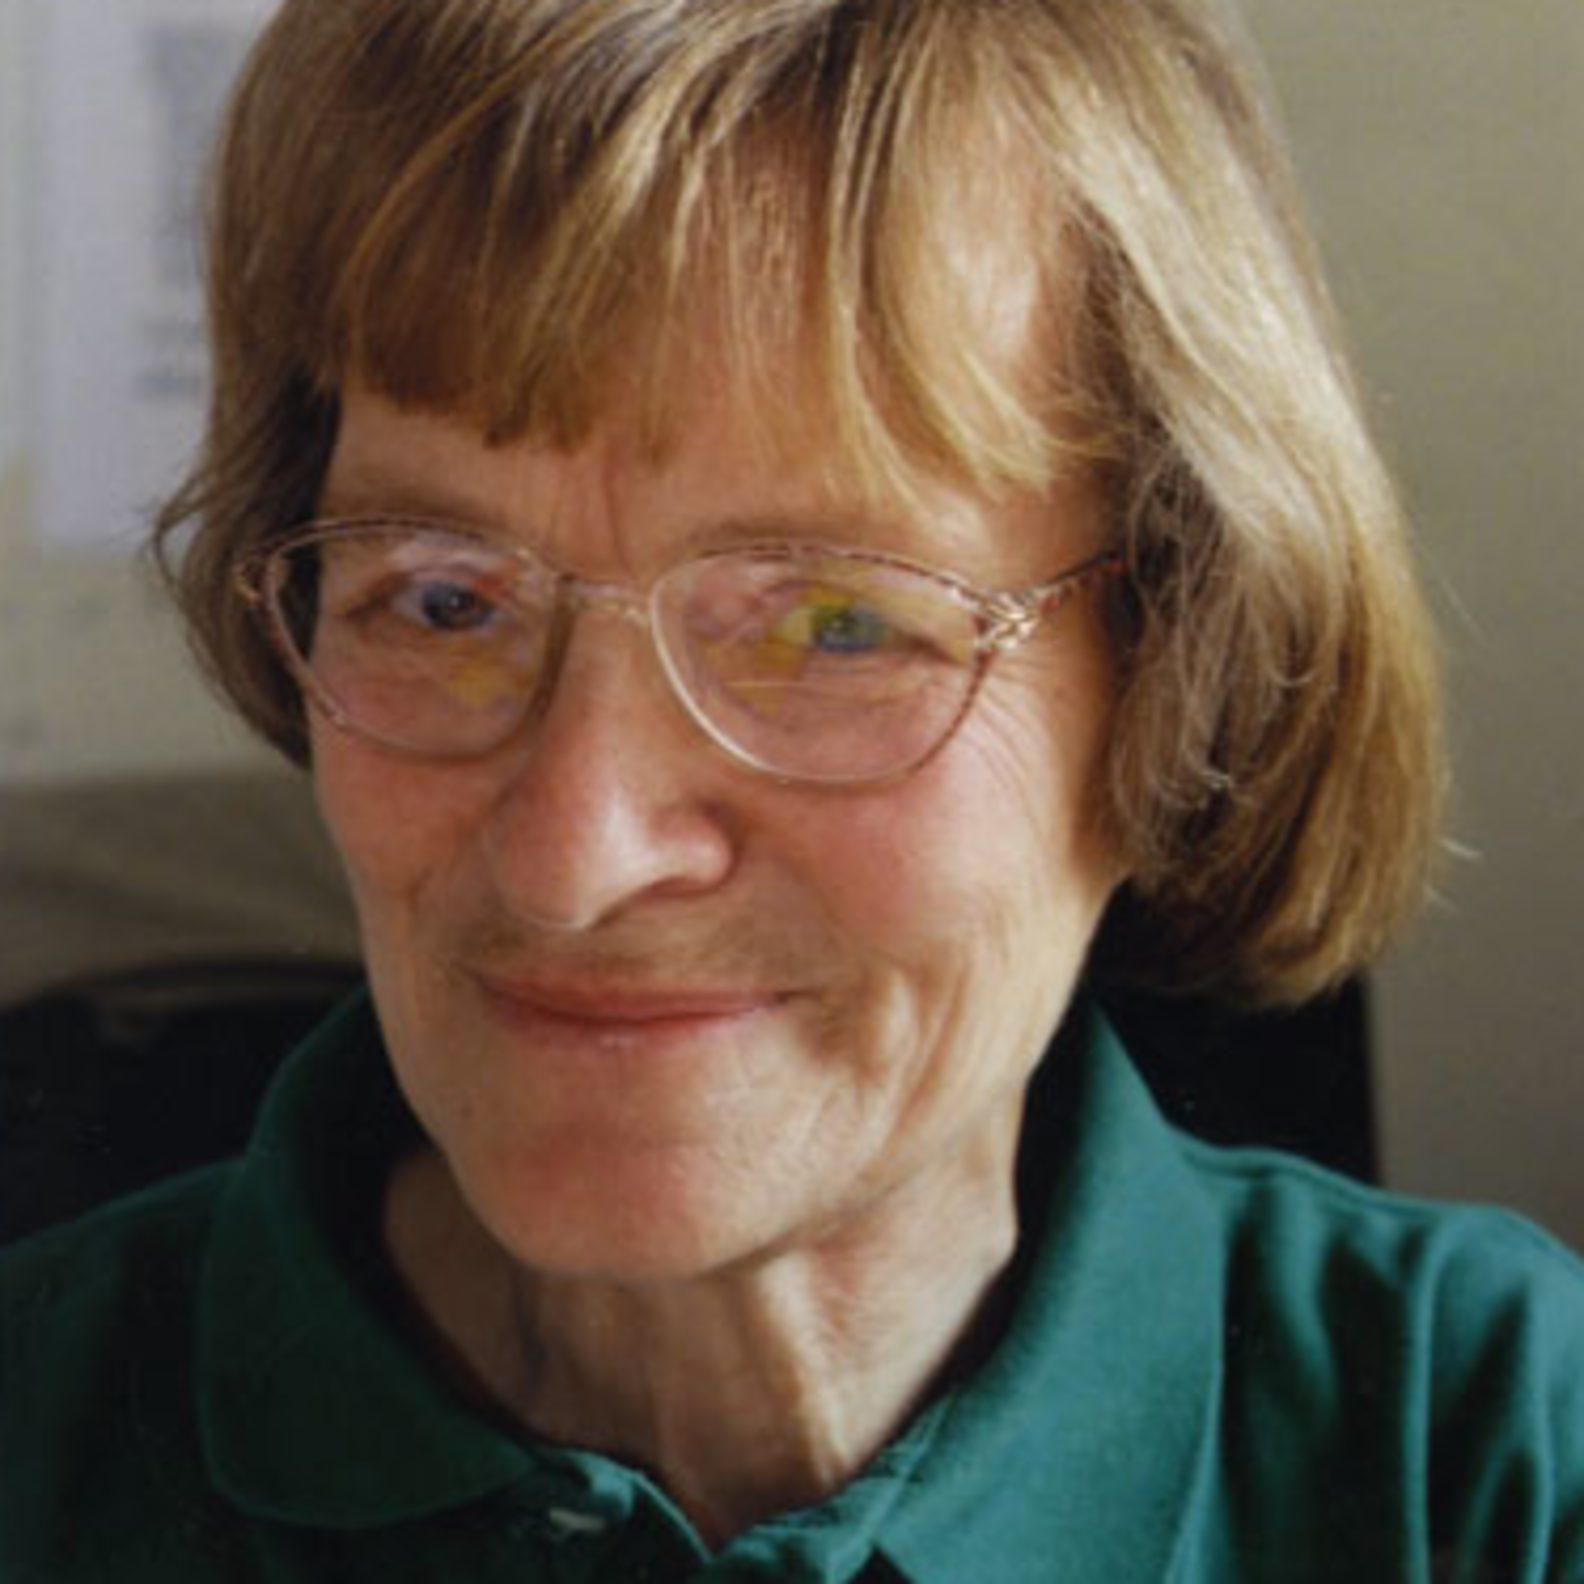 Friedensaktivistin Dr. Erika Drees